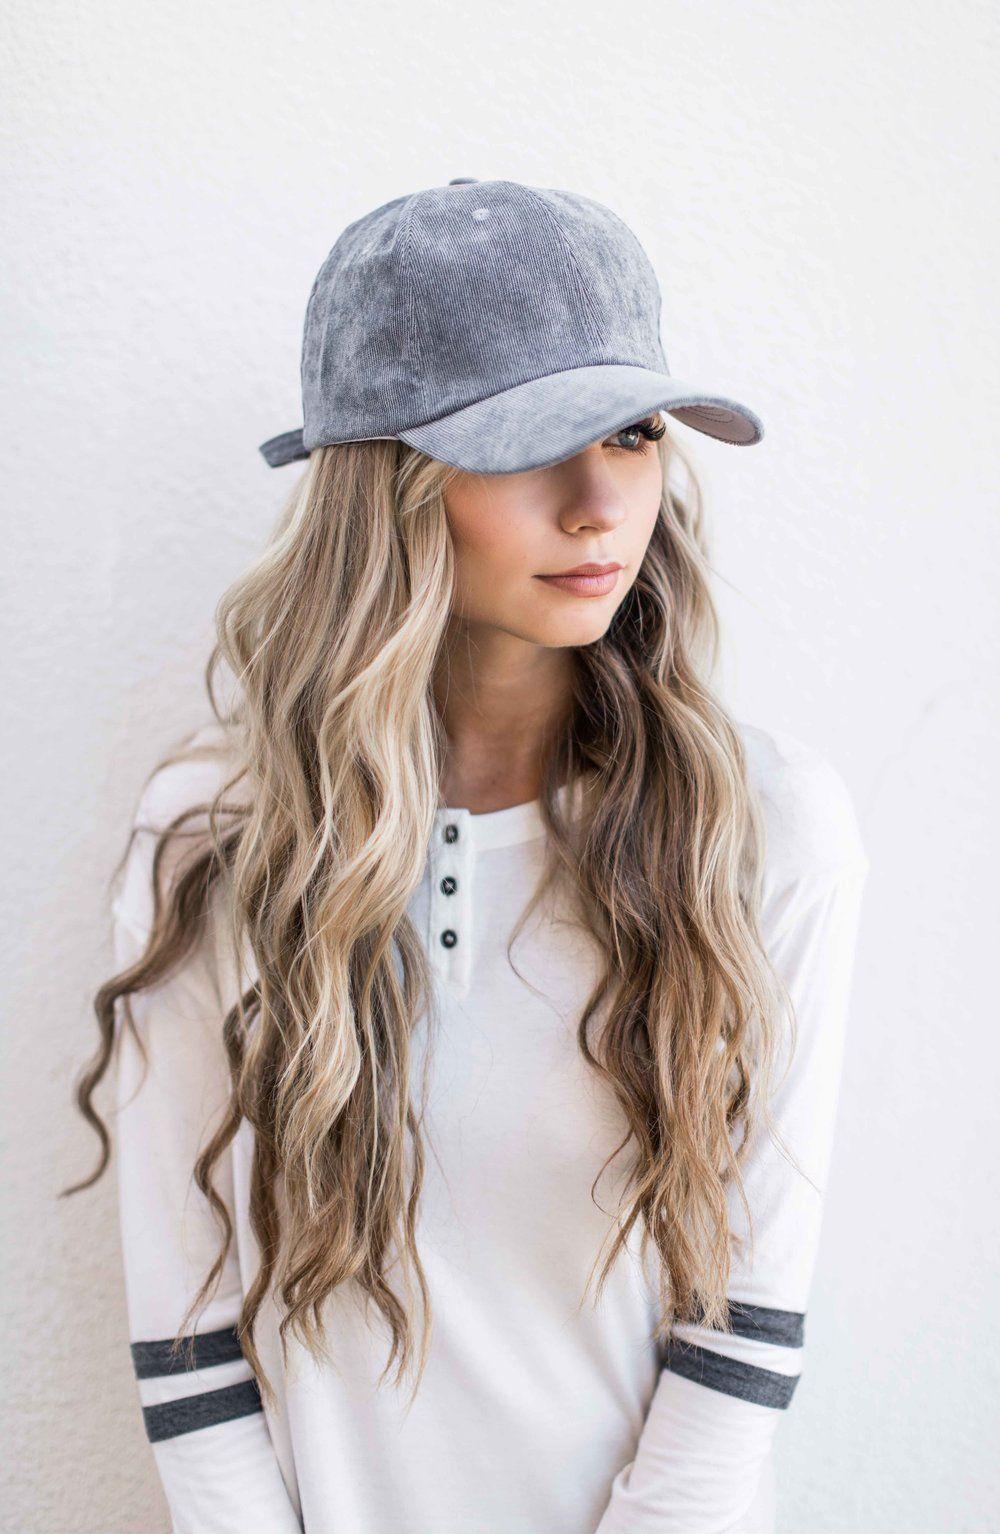 gray suede baseball cap, baseball cap, varsity stripe shirt